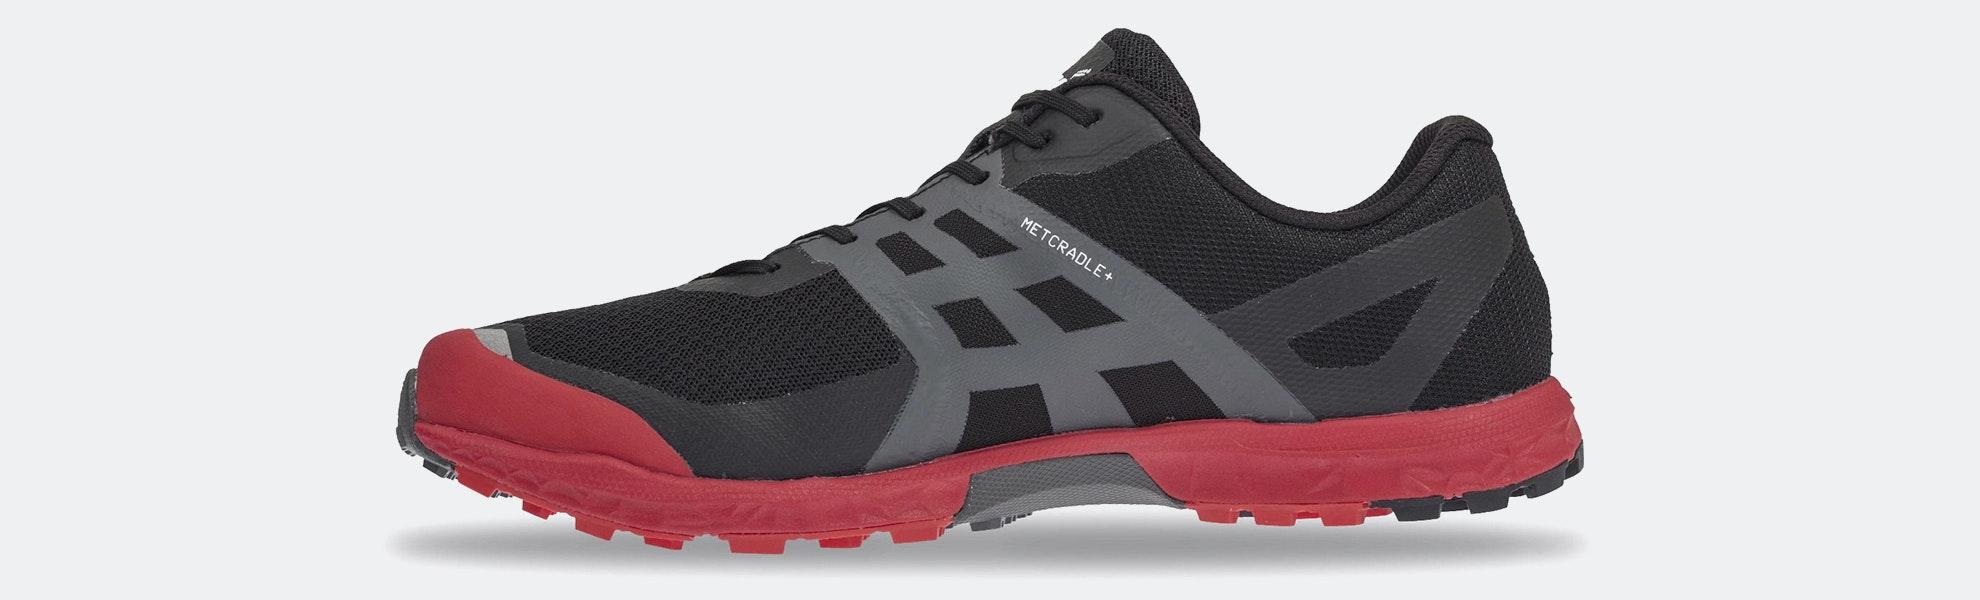 Inov-8 Trailroc 270 Trail Running Shoes